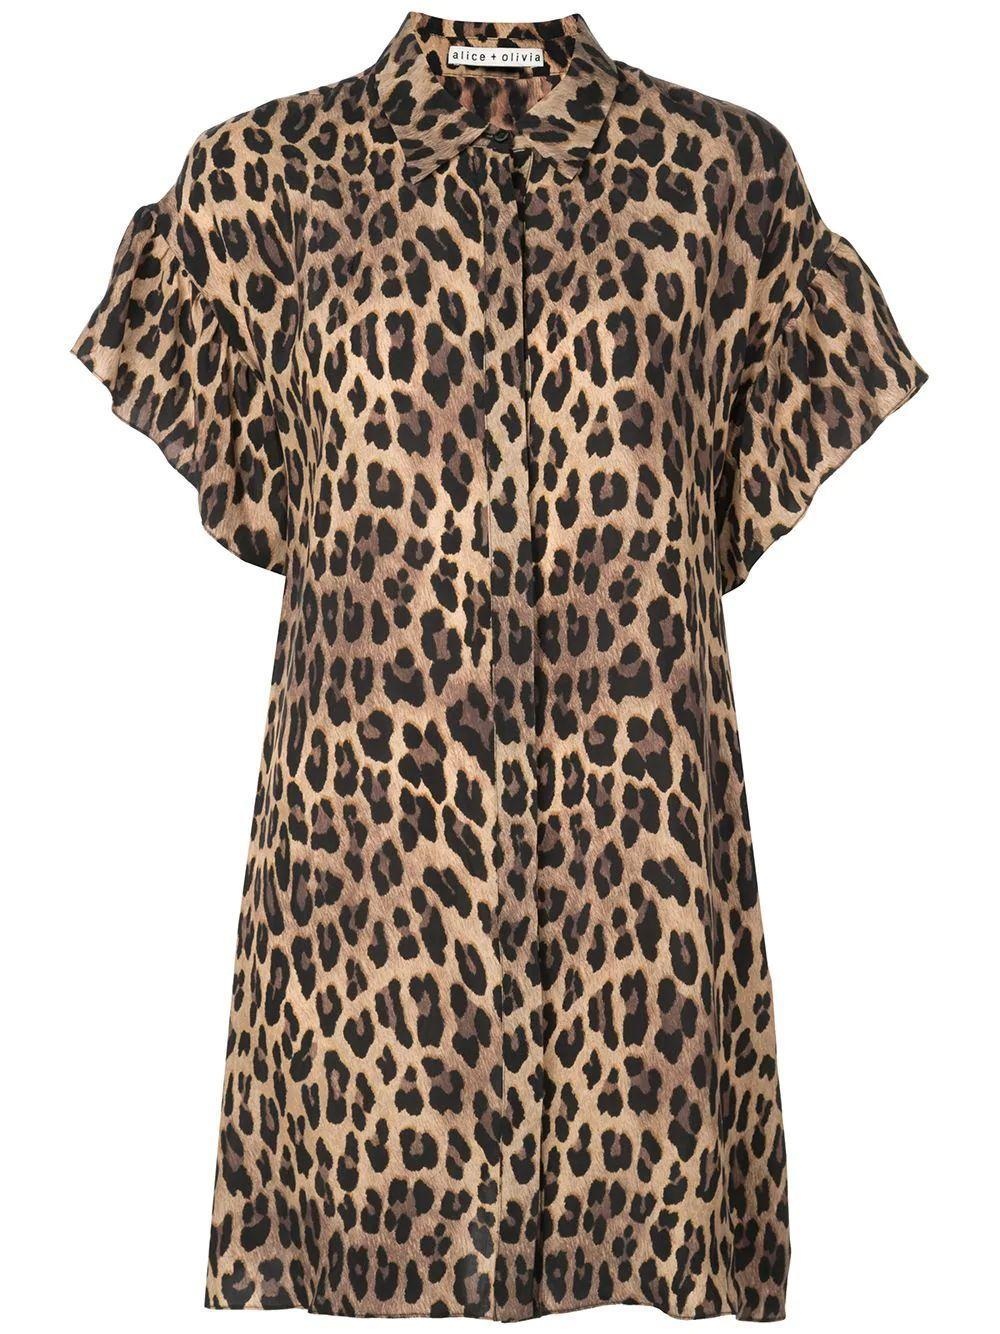 Jude Ruffle Button Down Tunic Dress Item # CC909P46503